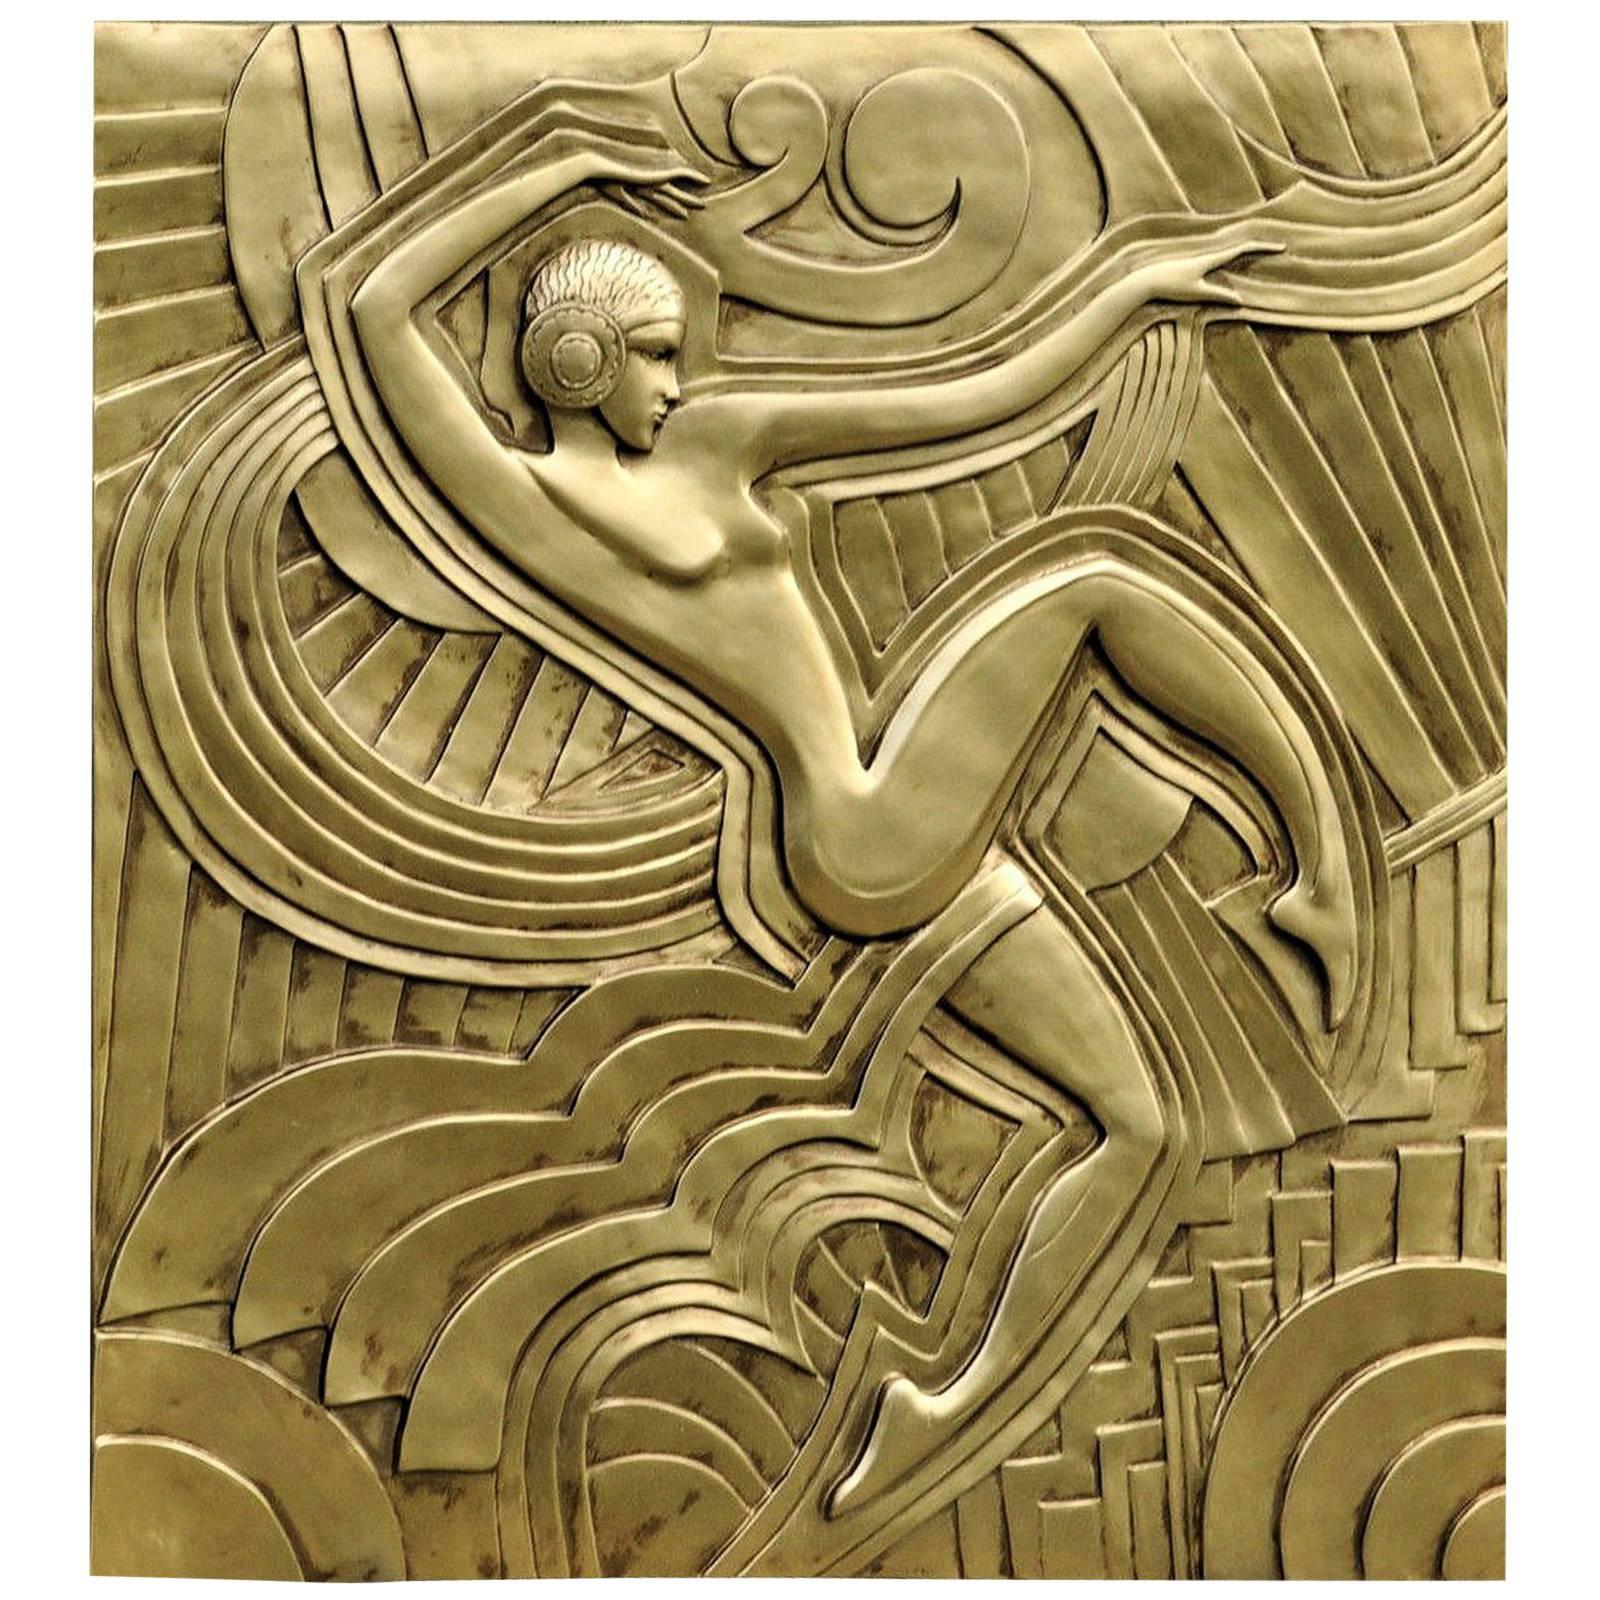 Art Deco u0027Folies Bergeresu0027 Wall Plaque  sc 1 st  1stDibs & Important Art Deco Mythological Gilt Wall Plaque For Sale at 1stdibs